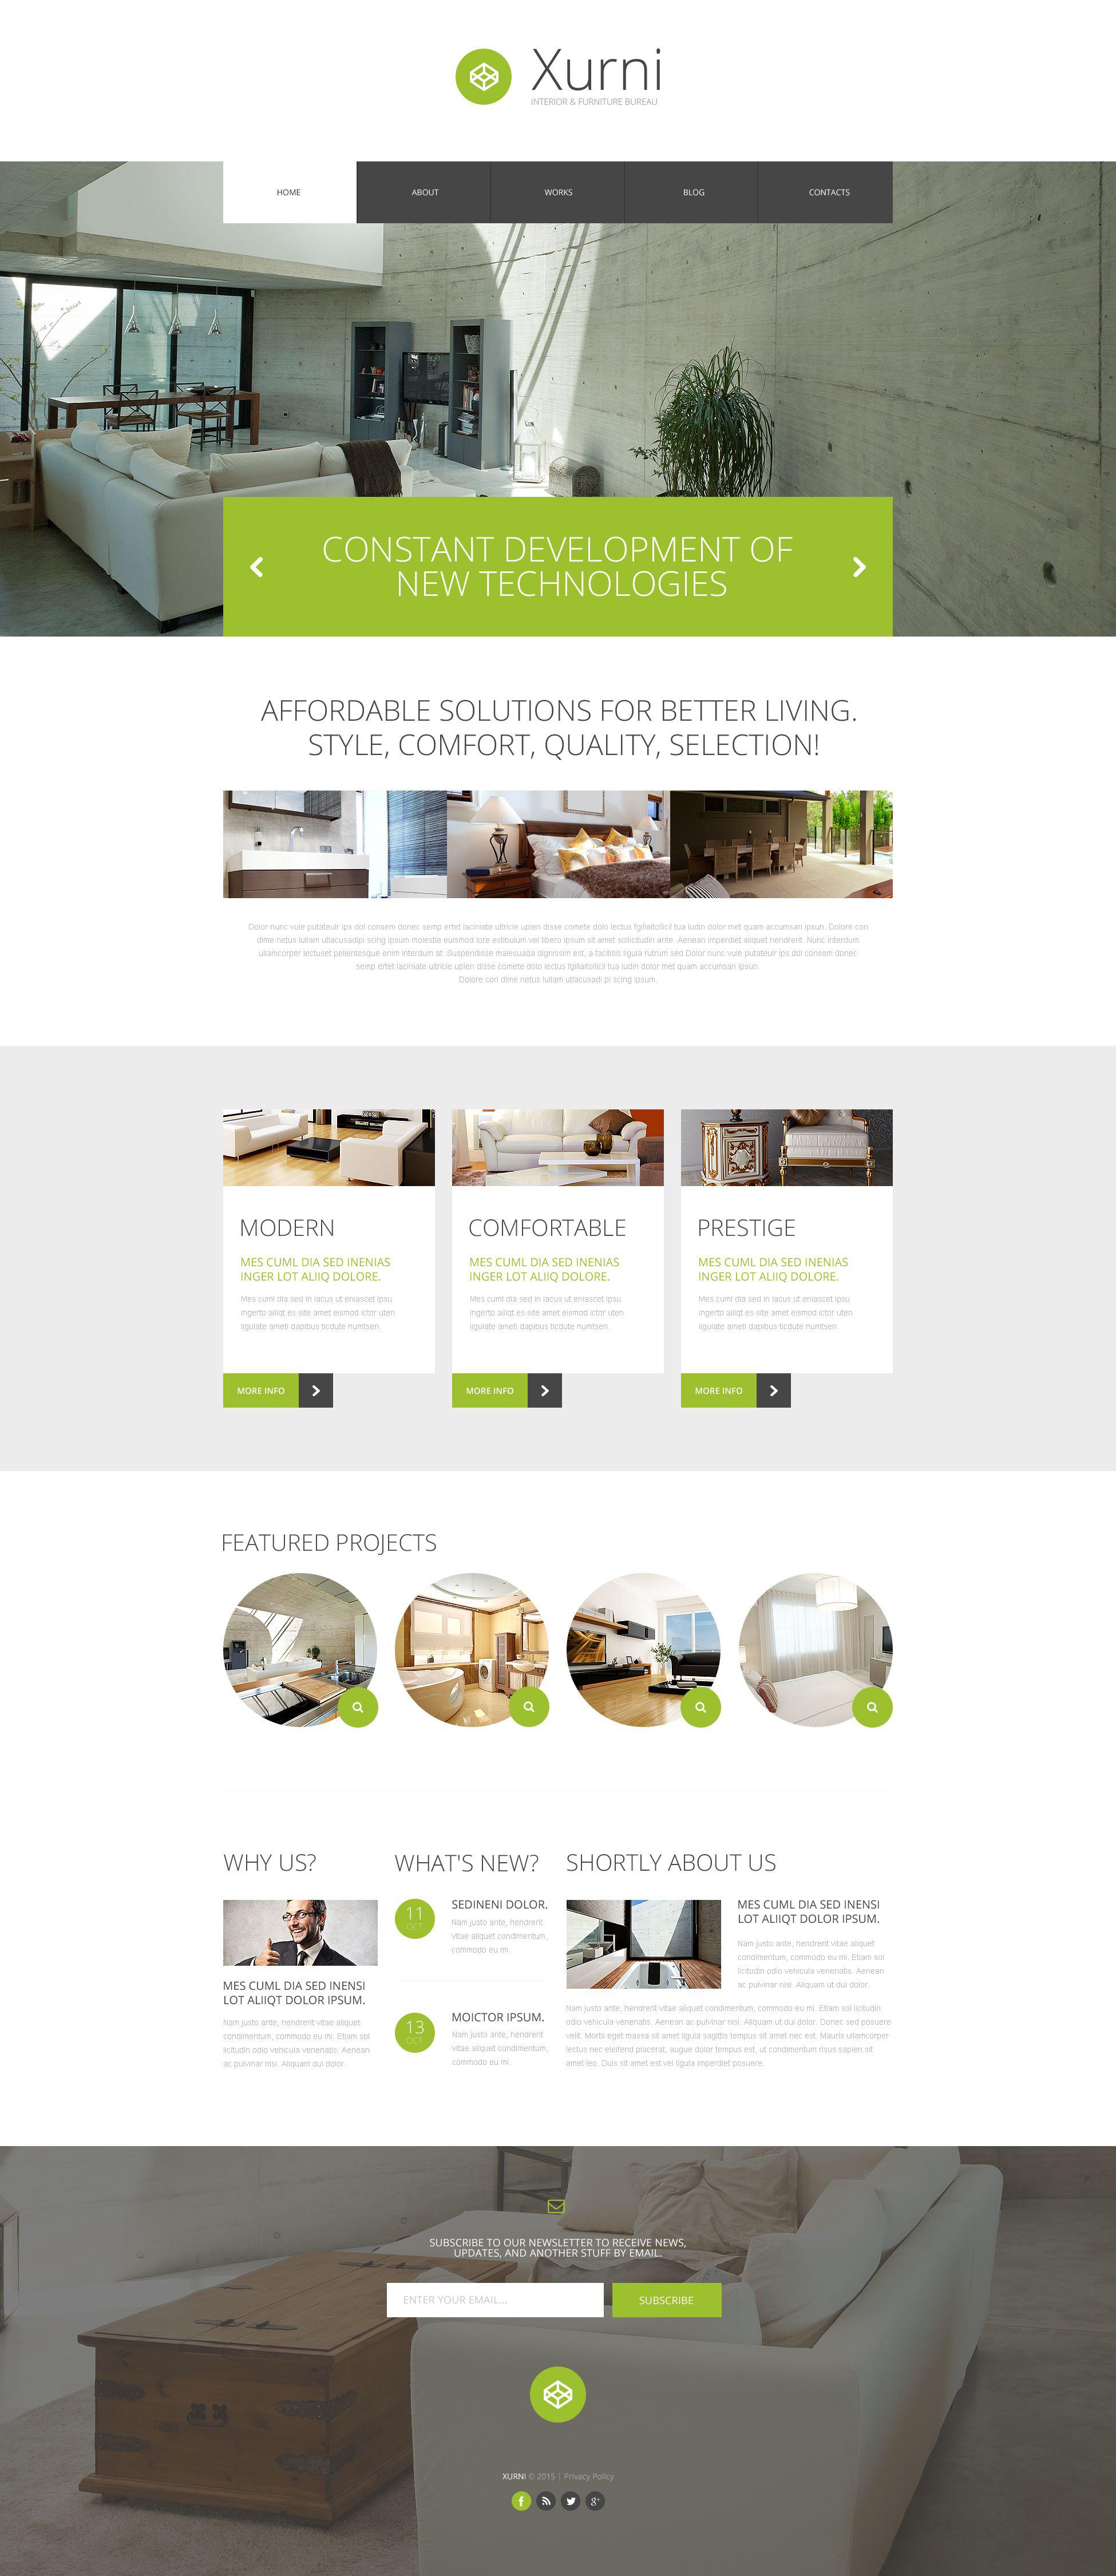 """Interior  Furniture Store"" 响应式WordPress模板 #53391 - 截图"